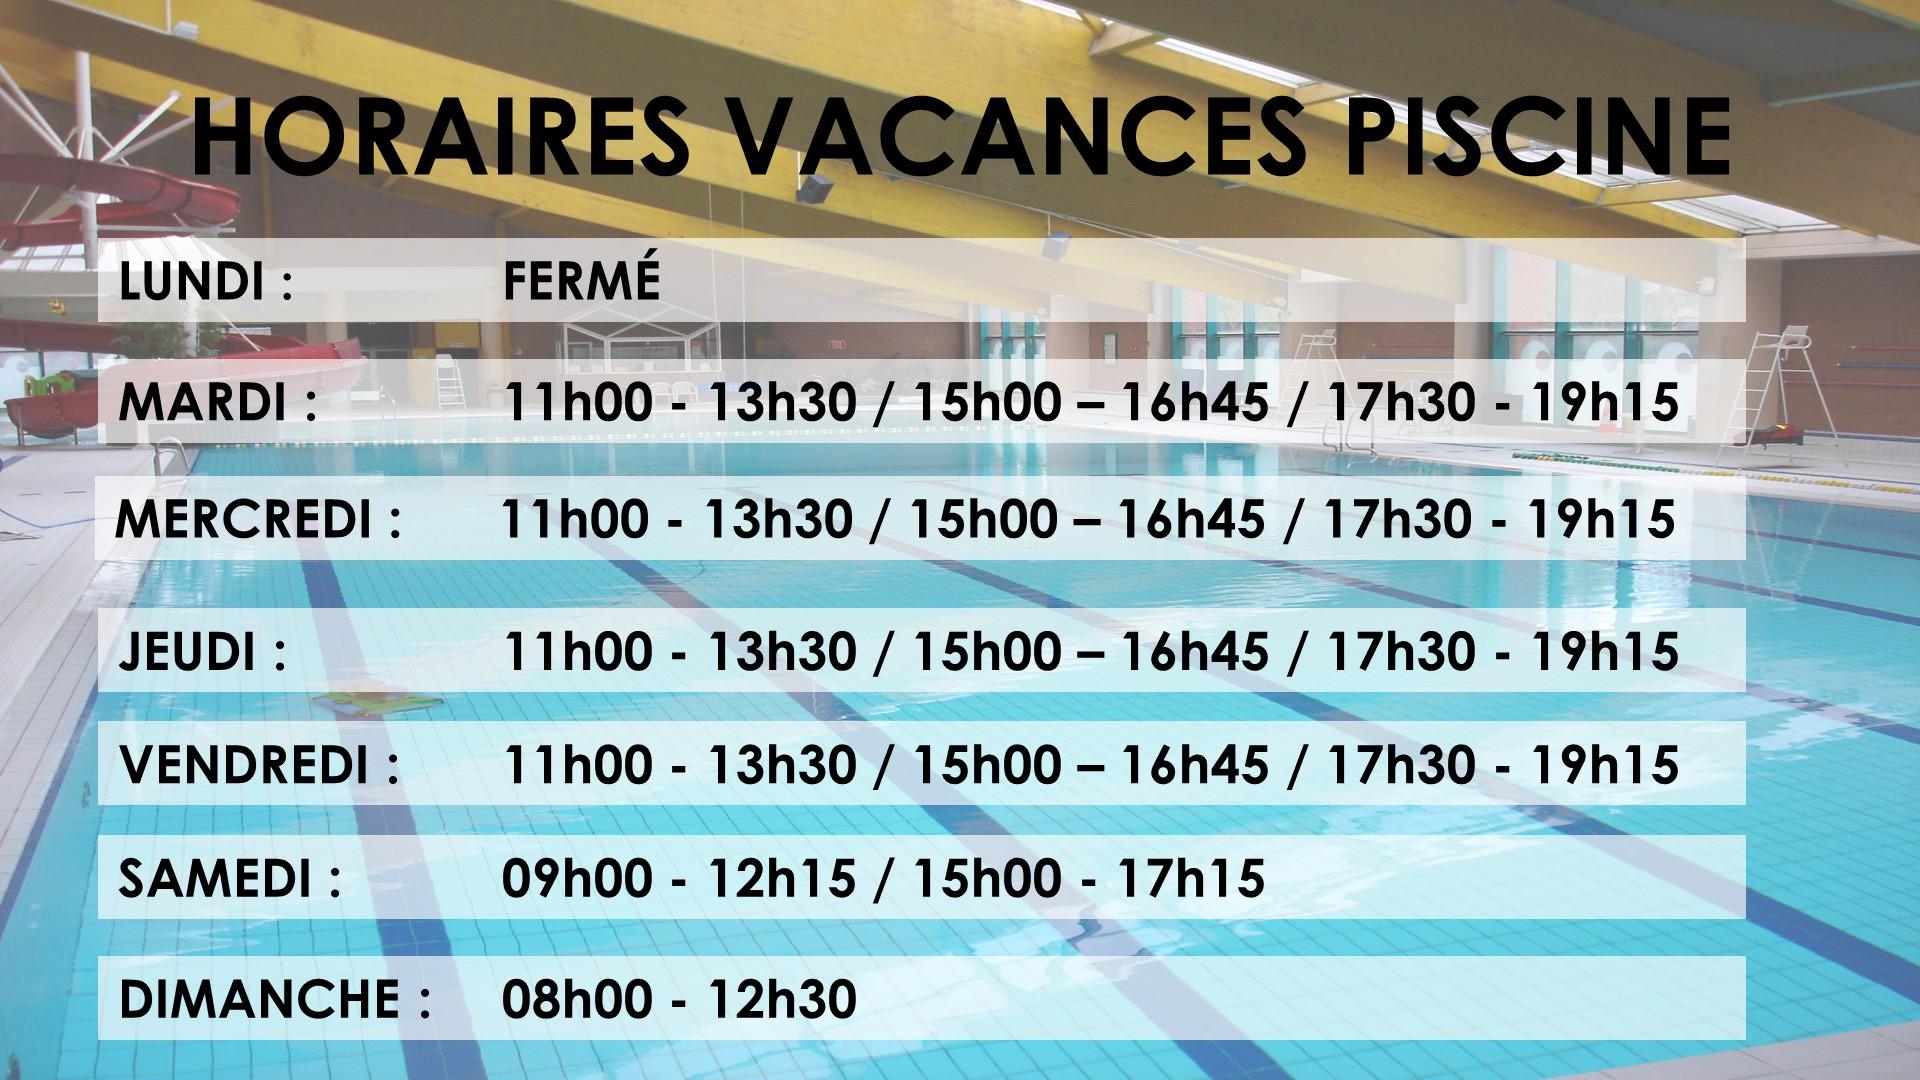 Horaires Piscine Vacances Scolaires – Sivu-Thalassa.fr pour Piscine Thalassa Roubaix